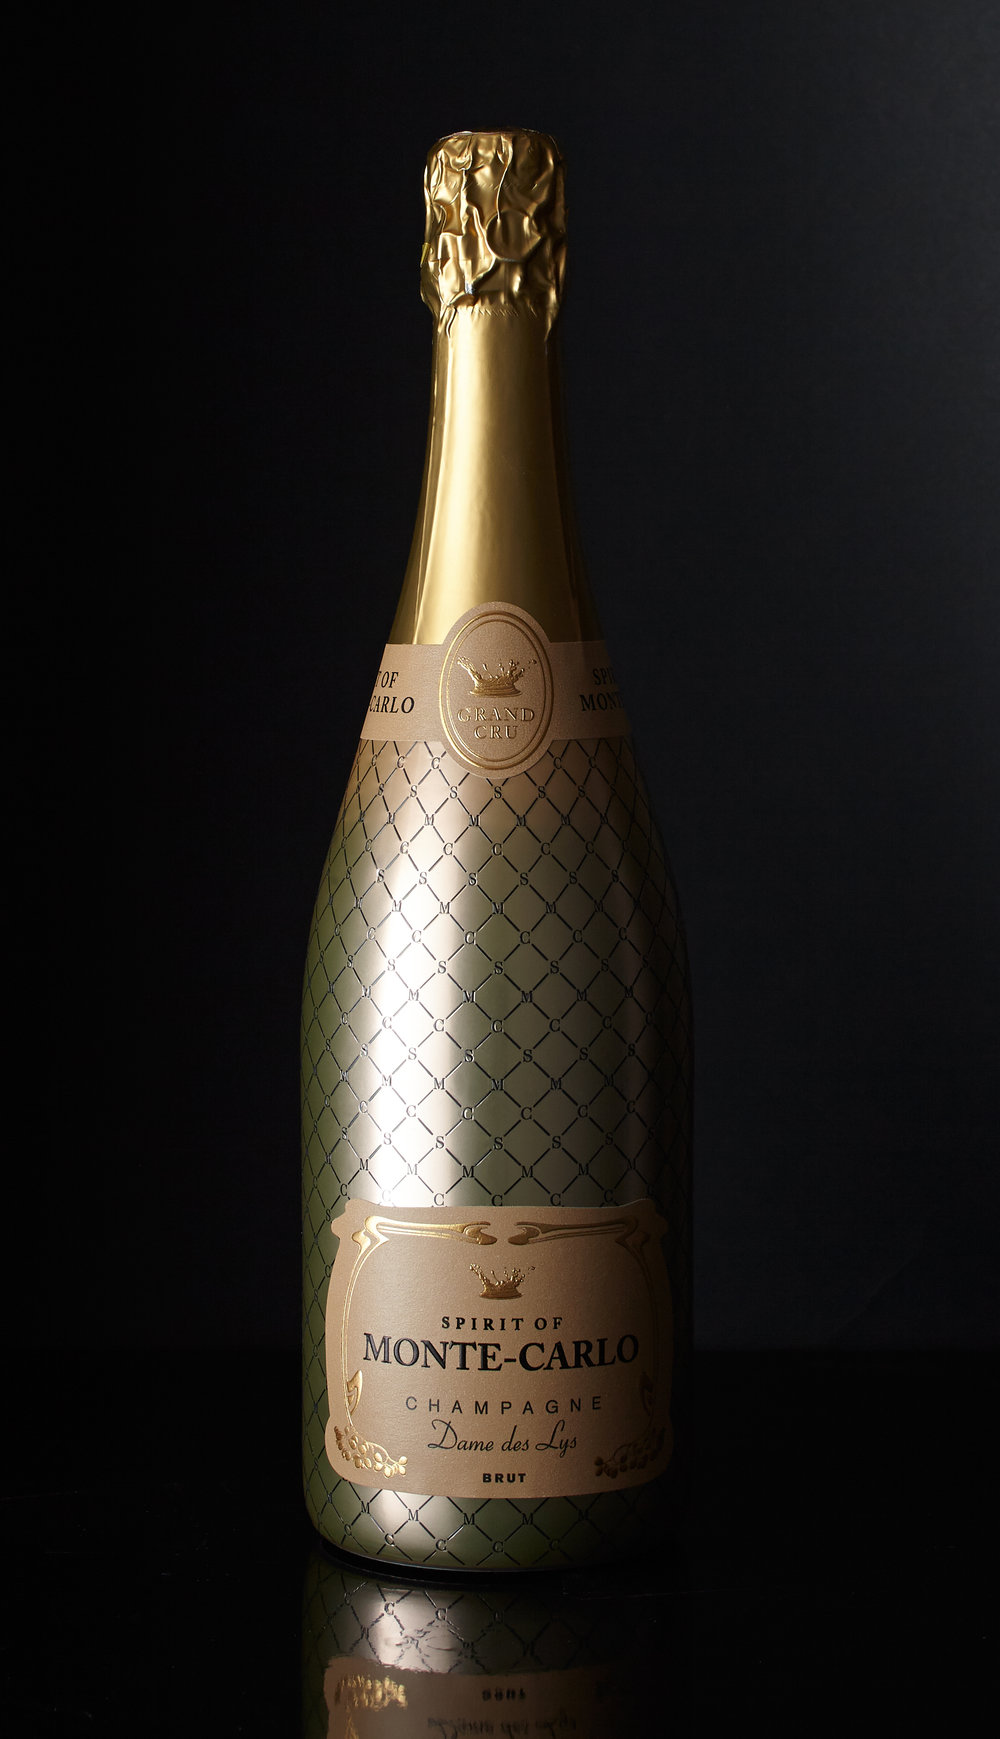 01_Champagne Montecarlo still life7934.jpg